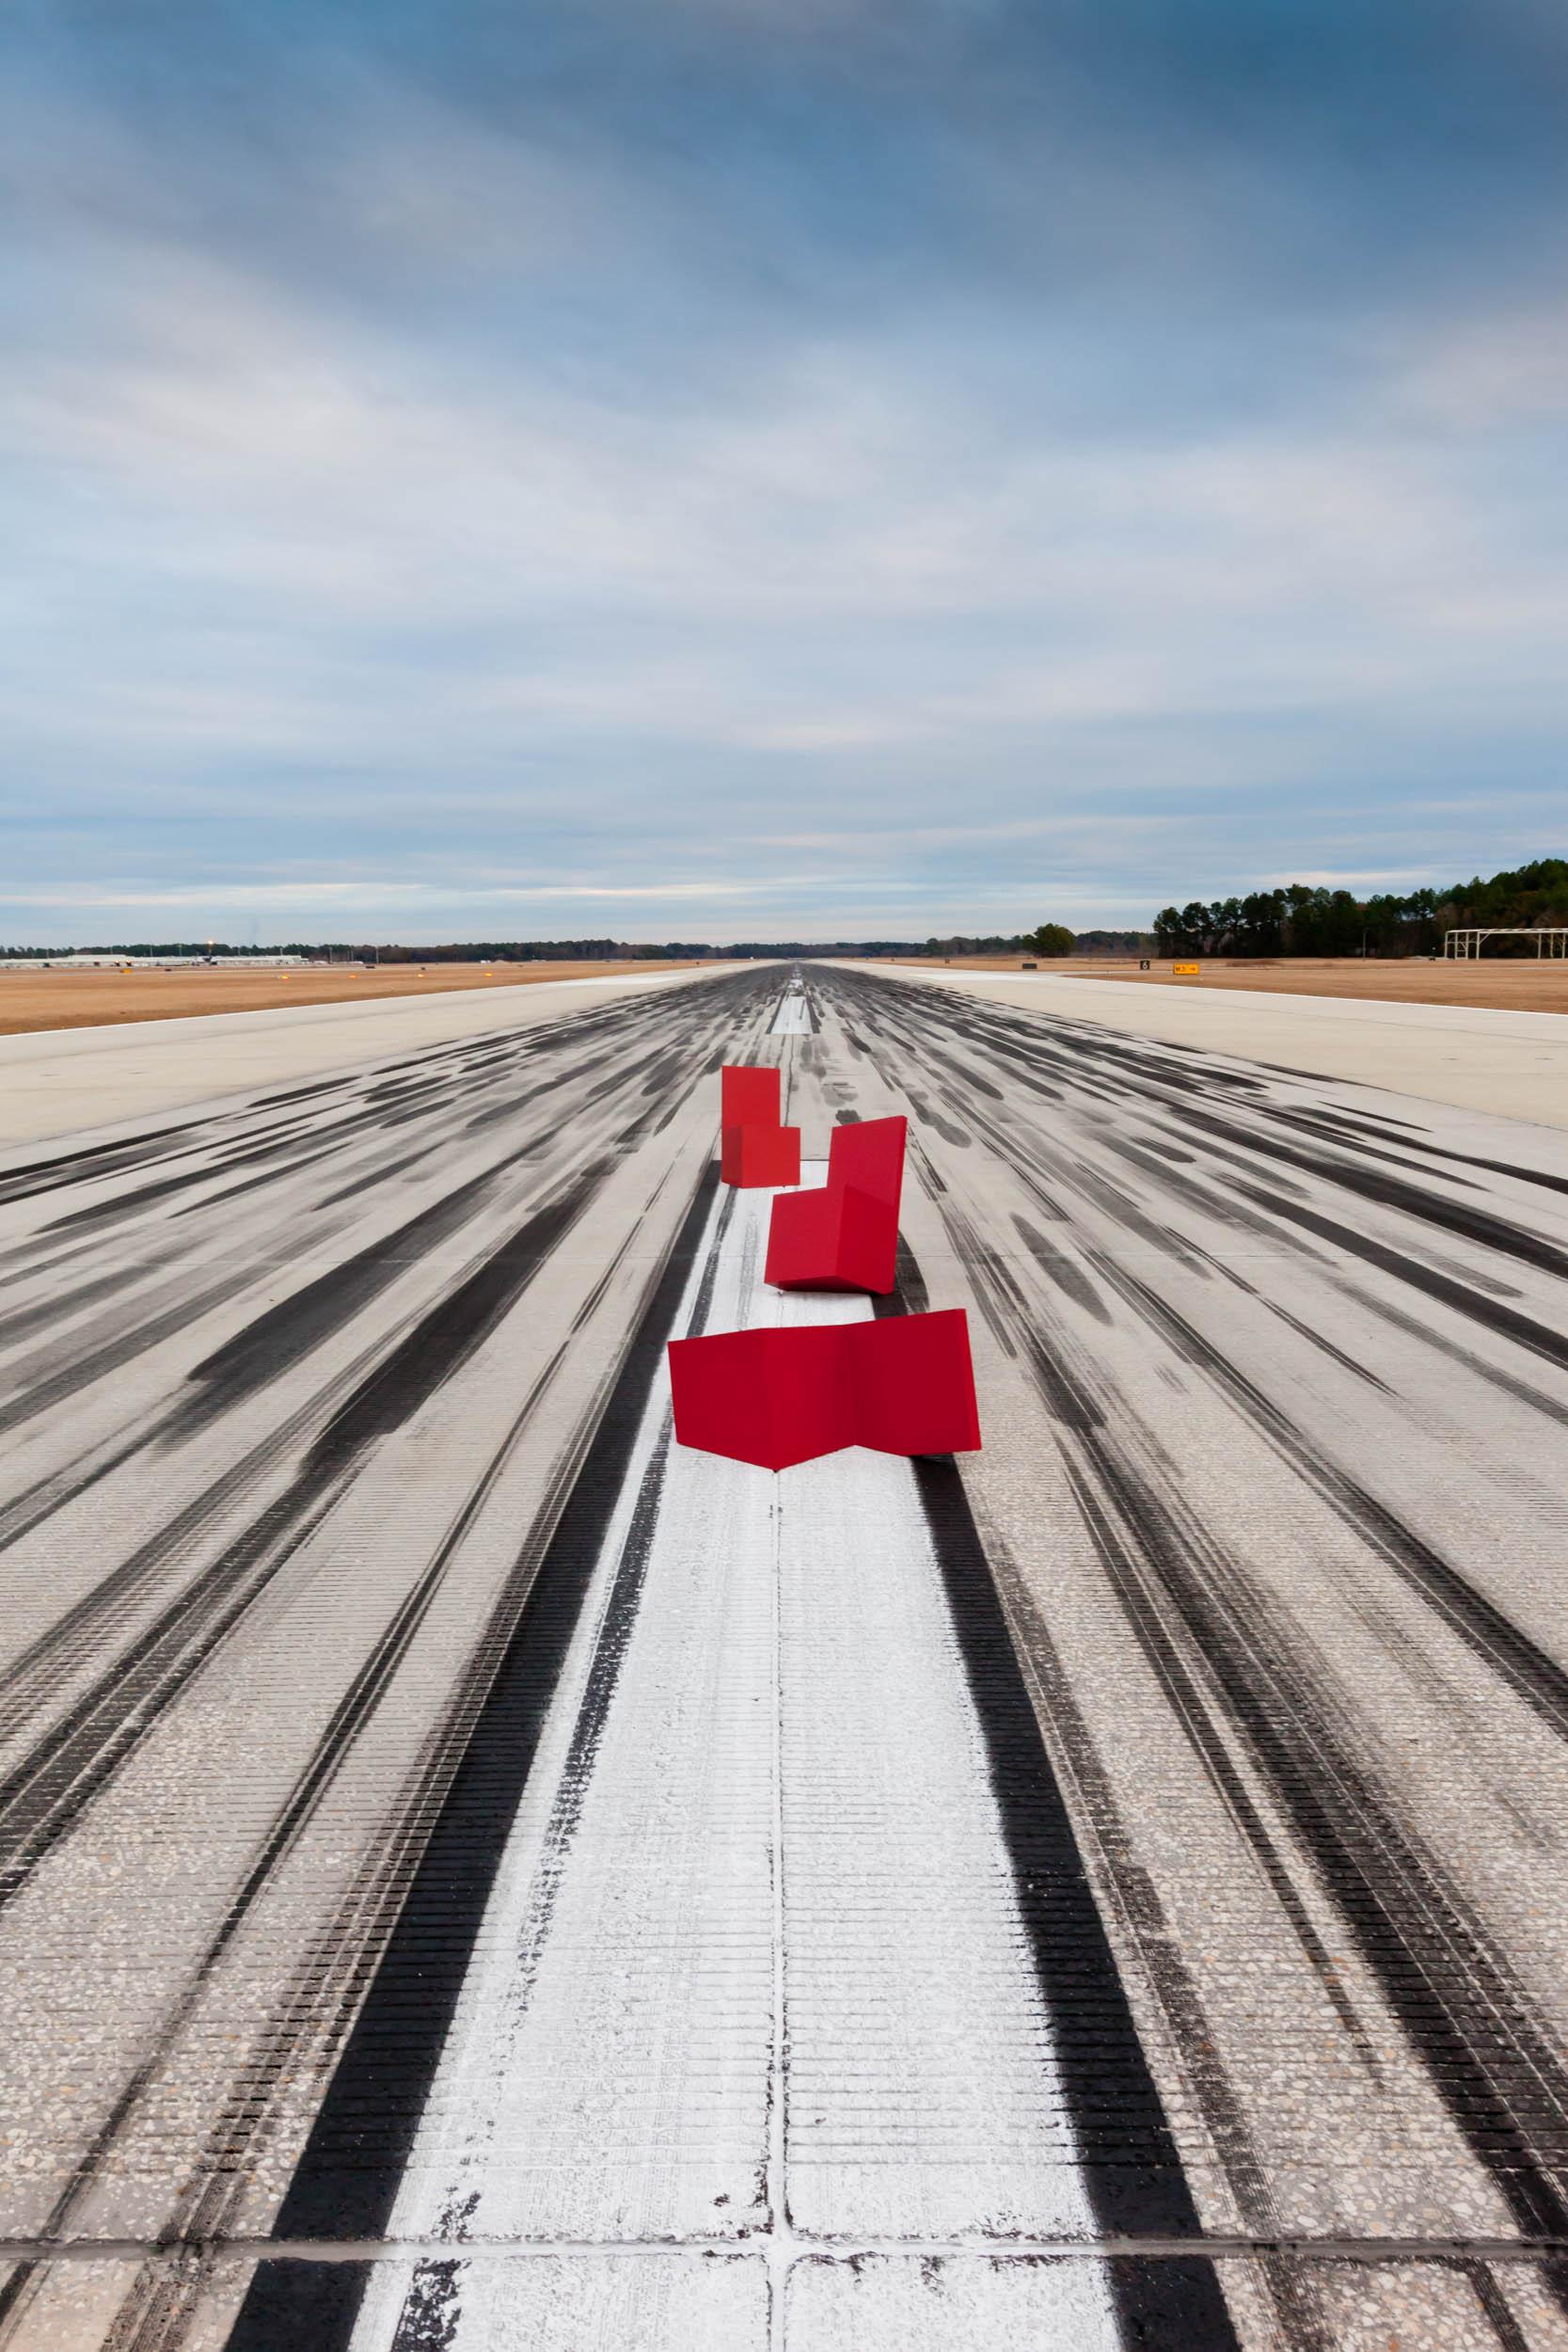 Landing on Runway 13